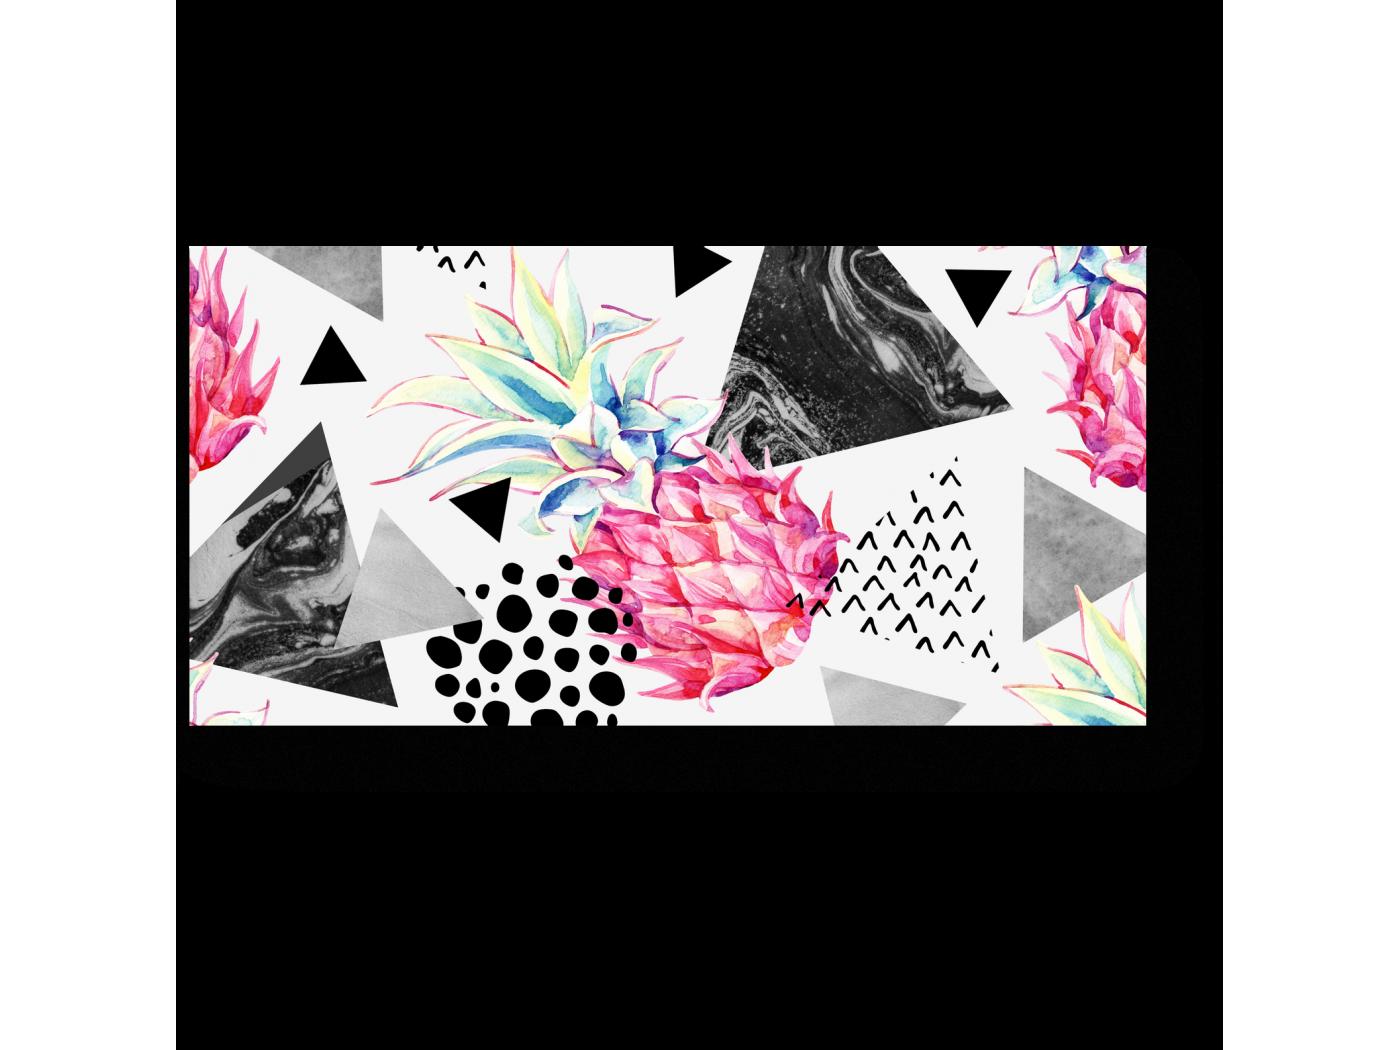 Модульная картина Ананасовая геометрия (40x20) фото